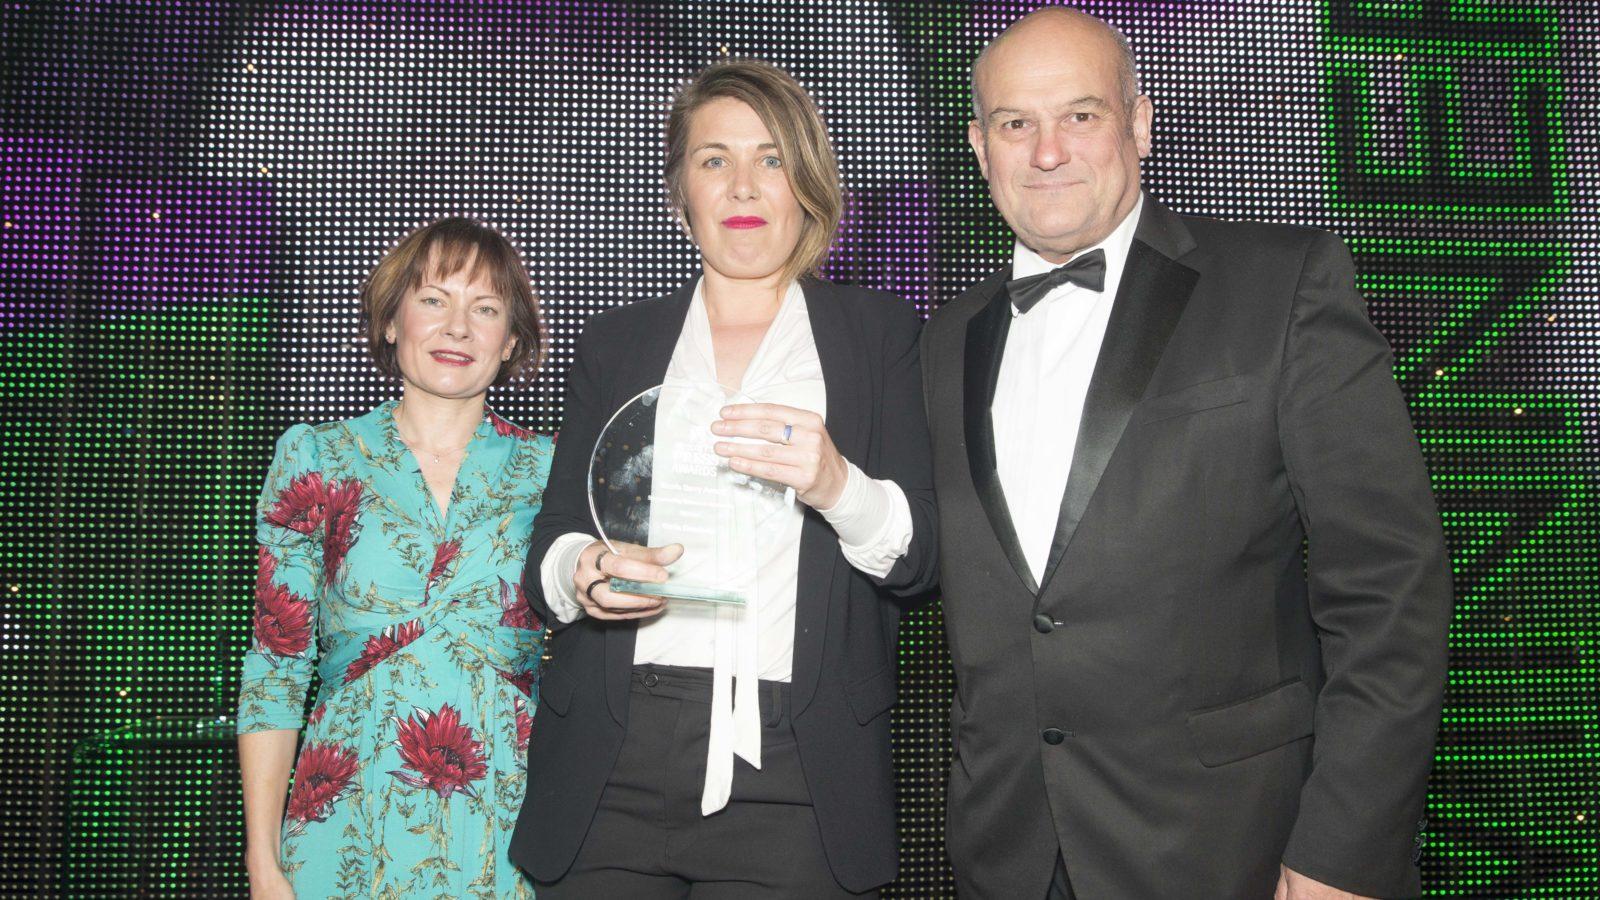 Nicola Barry Award Sponsored by Woman in Journalism  - @WIJ_Scotland Winner Karin Goodwin, The Ferret and Sunday National